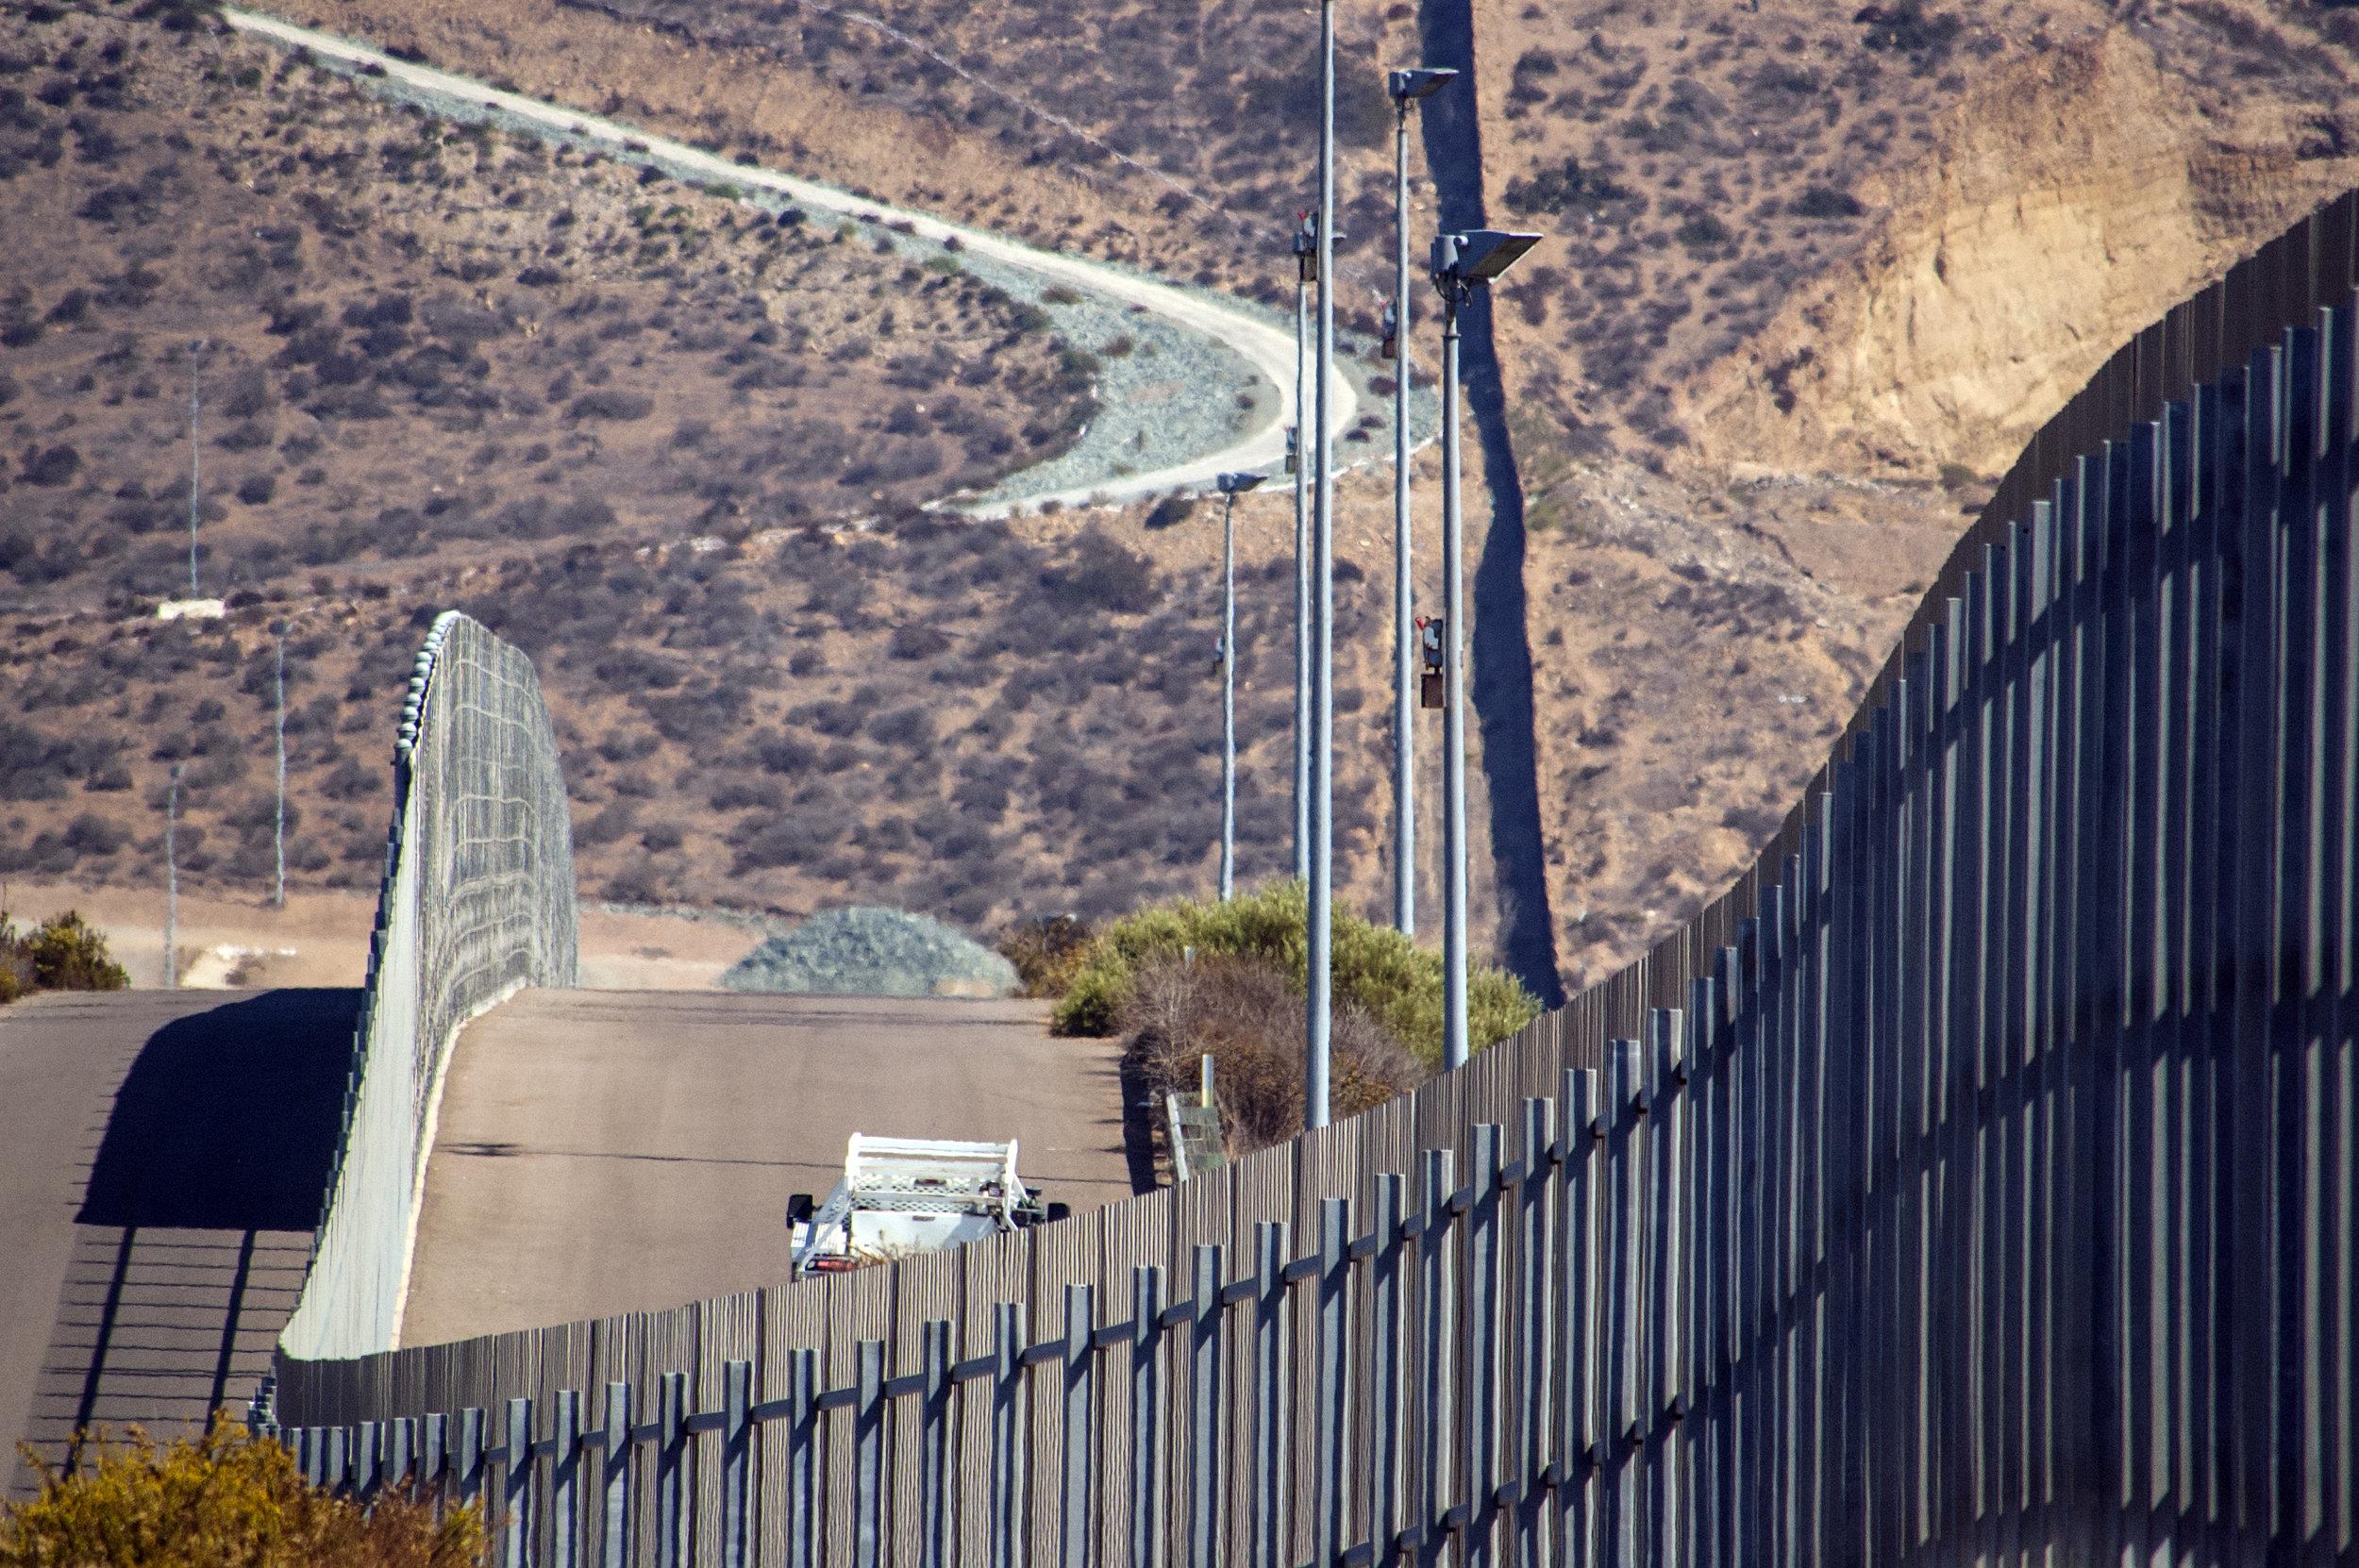 002 The CA Border Fence.jpg